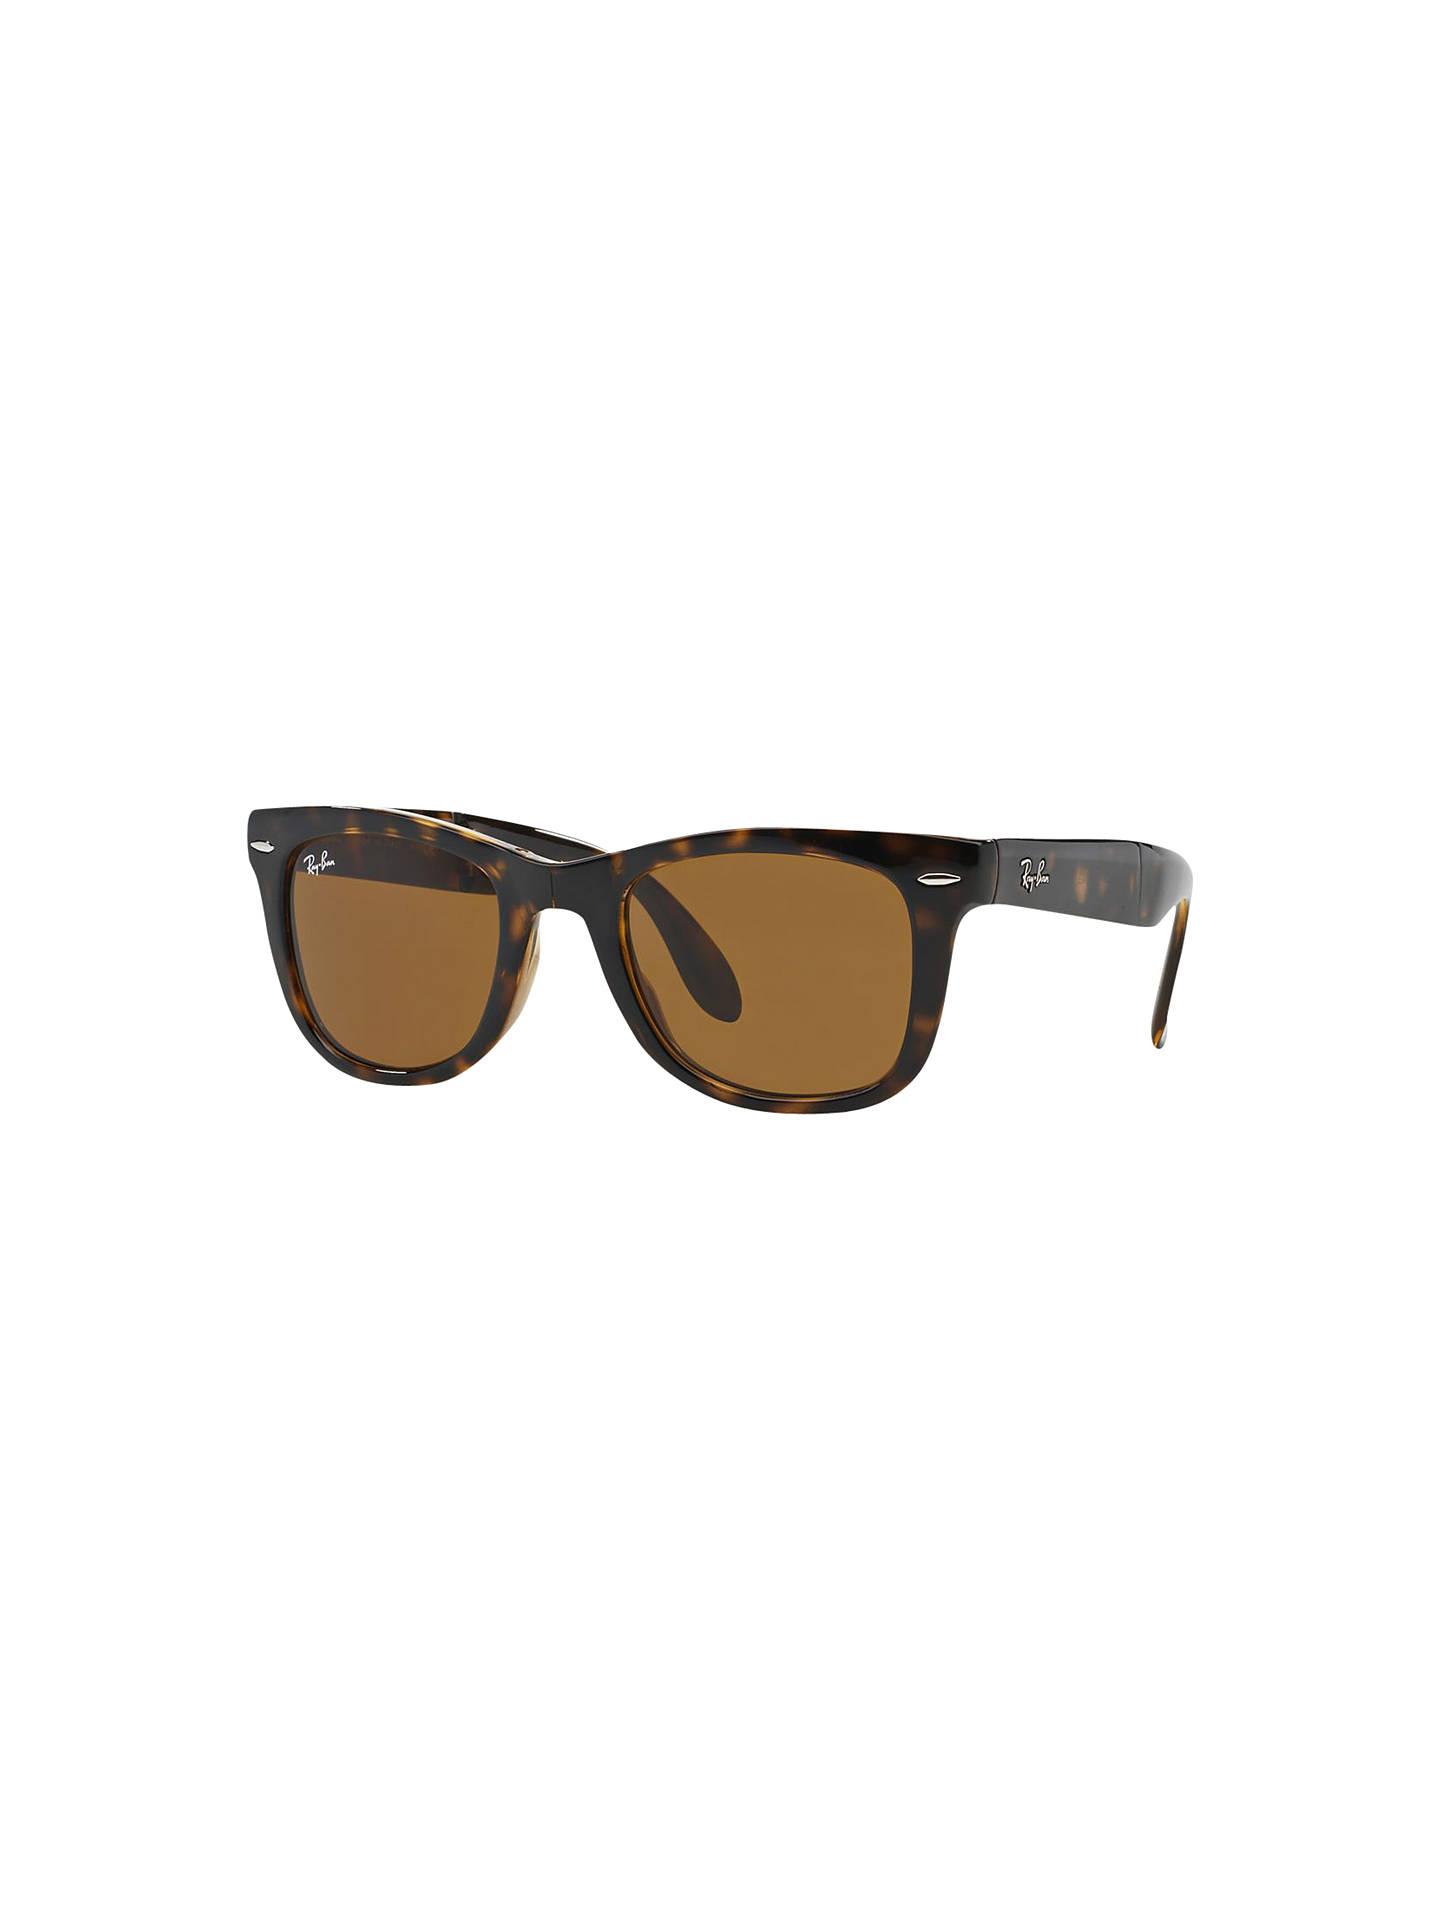 7c5b1f9b47 Ray-Ban RB4105 Men s Folding Wayfarer Sunglasses at John Lewis ...